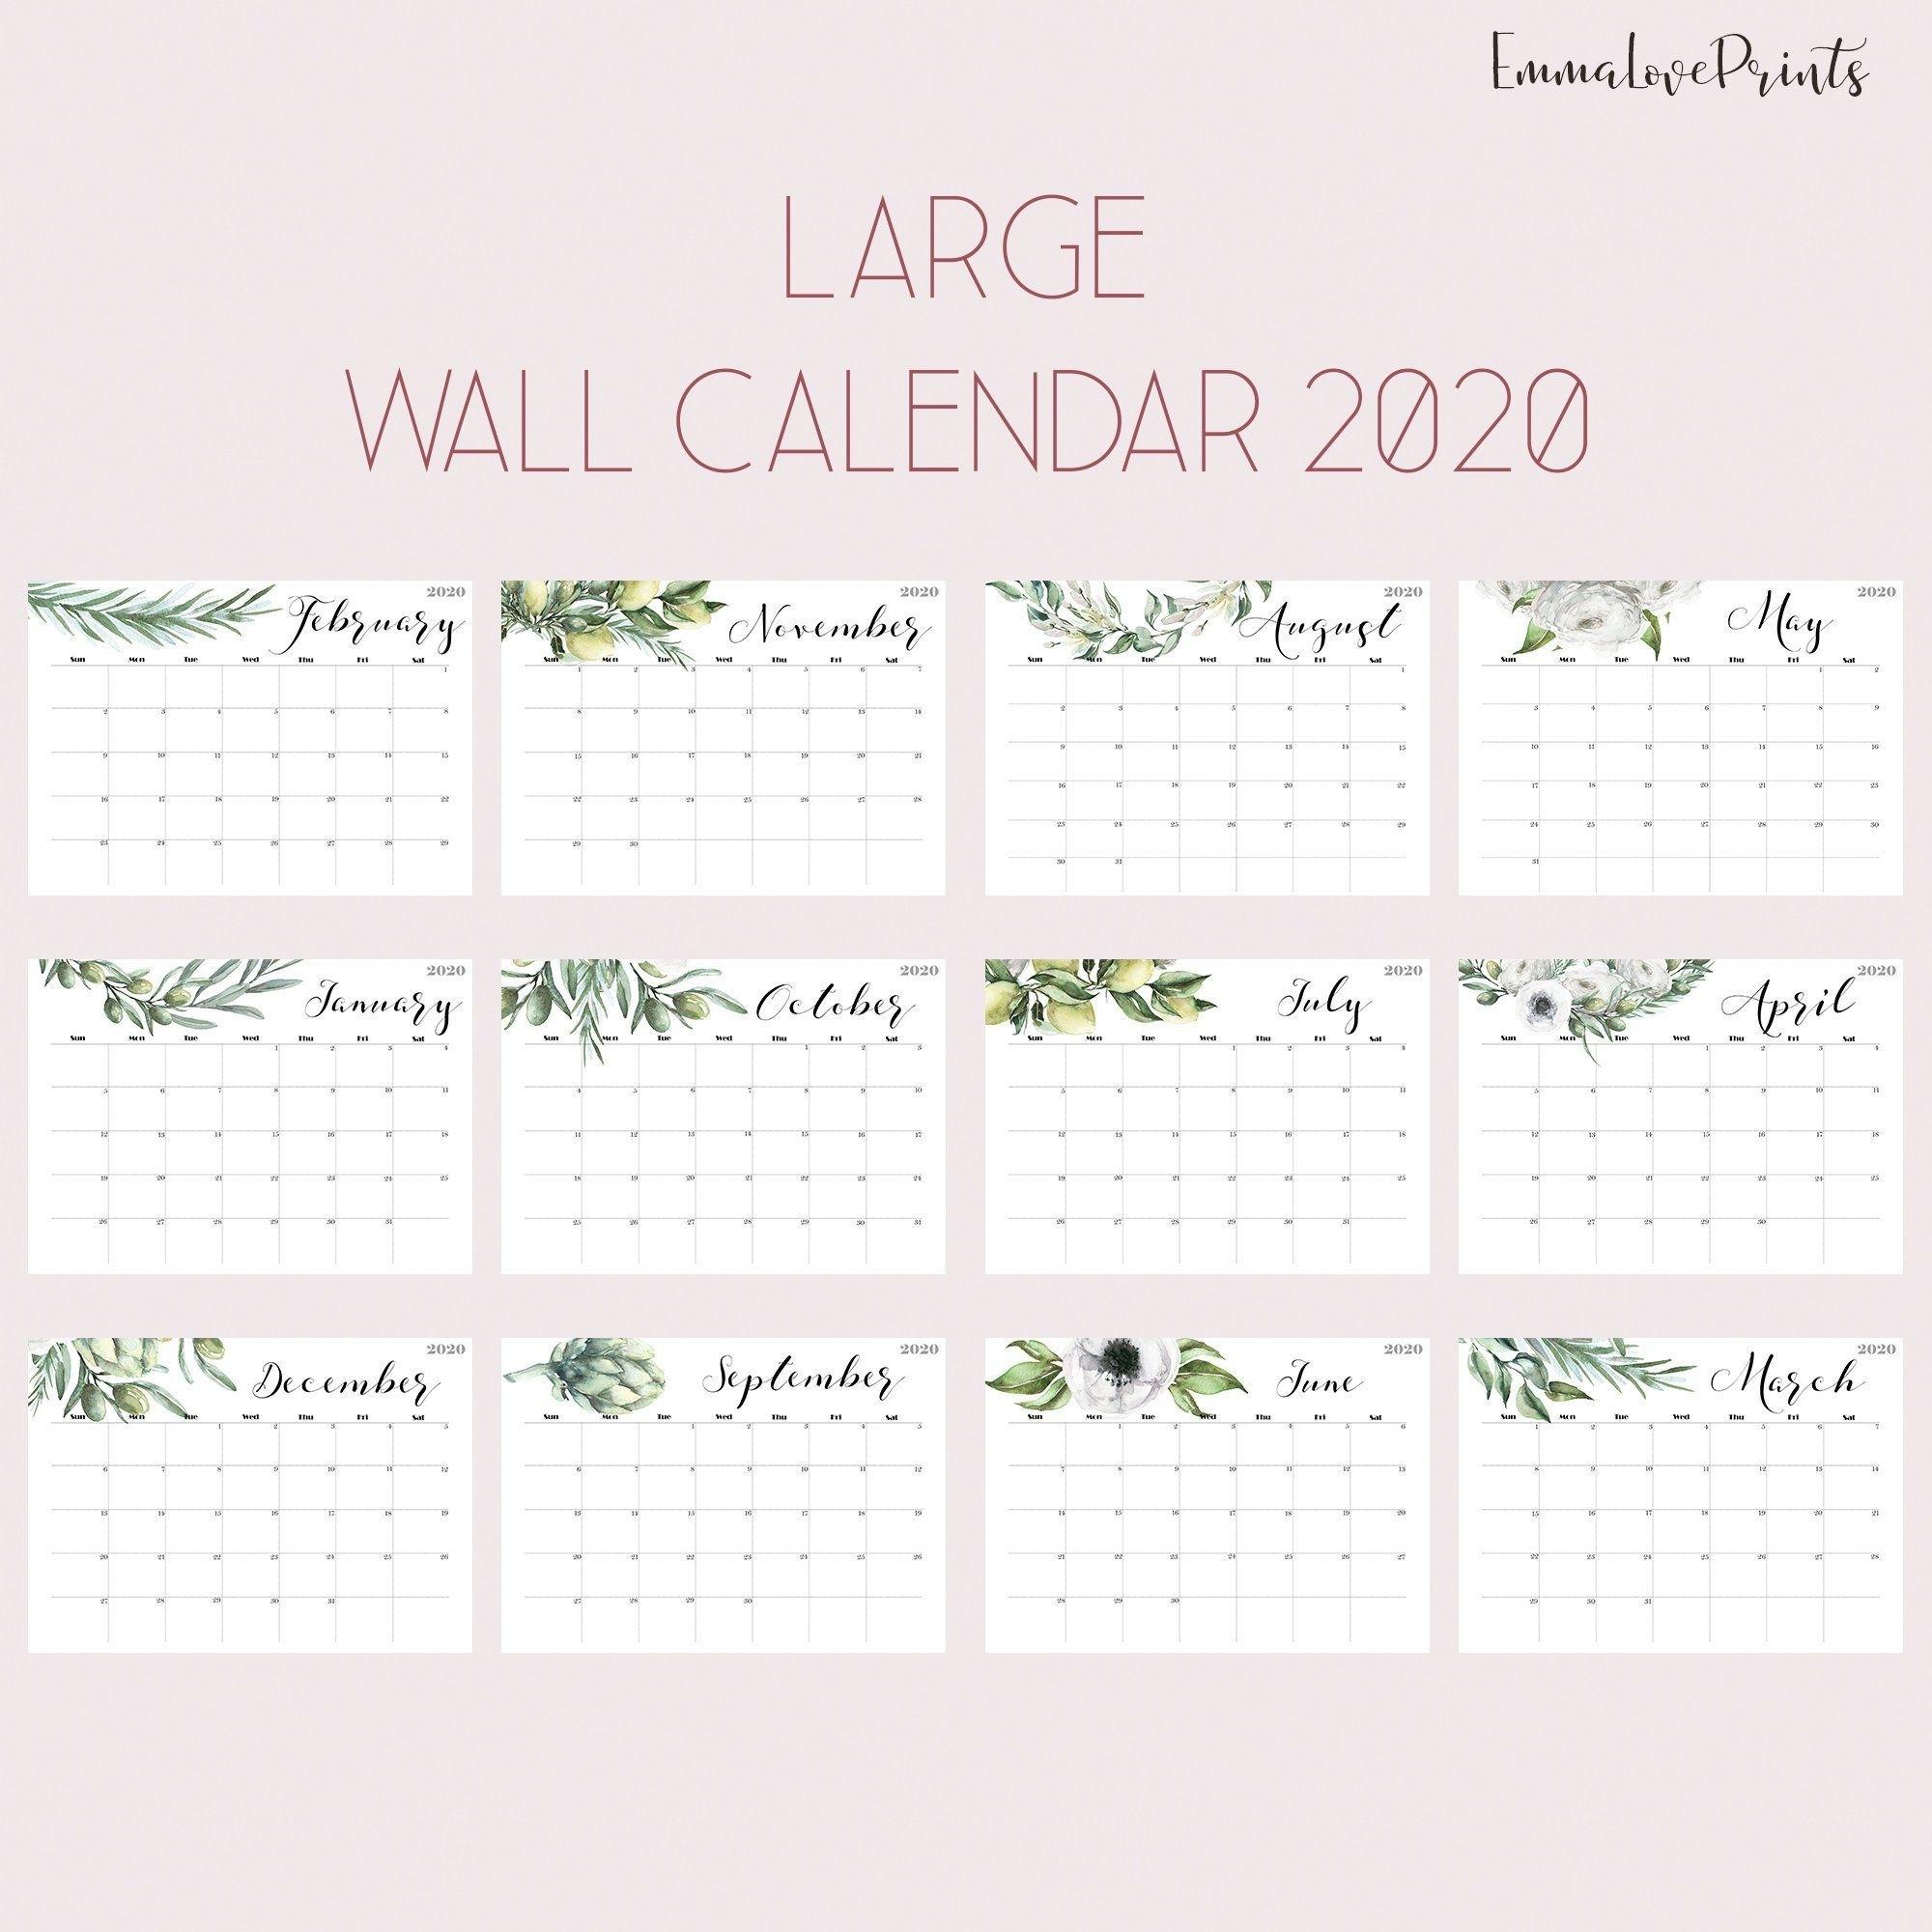 Large Wall Calendar 2020 Wall Calendar Printable Botanical Plants pertaining to 2020 Wall Calendar Kikki K